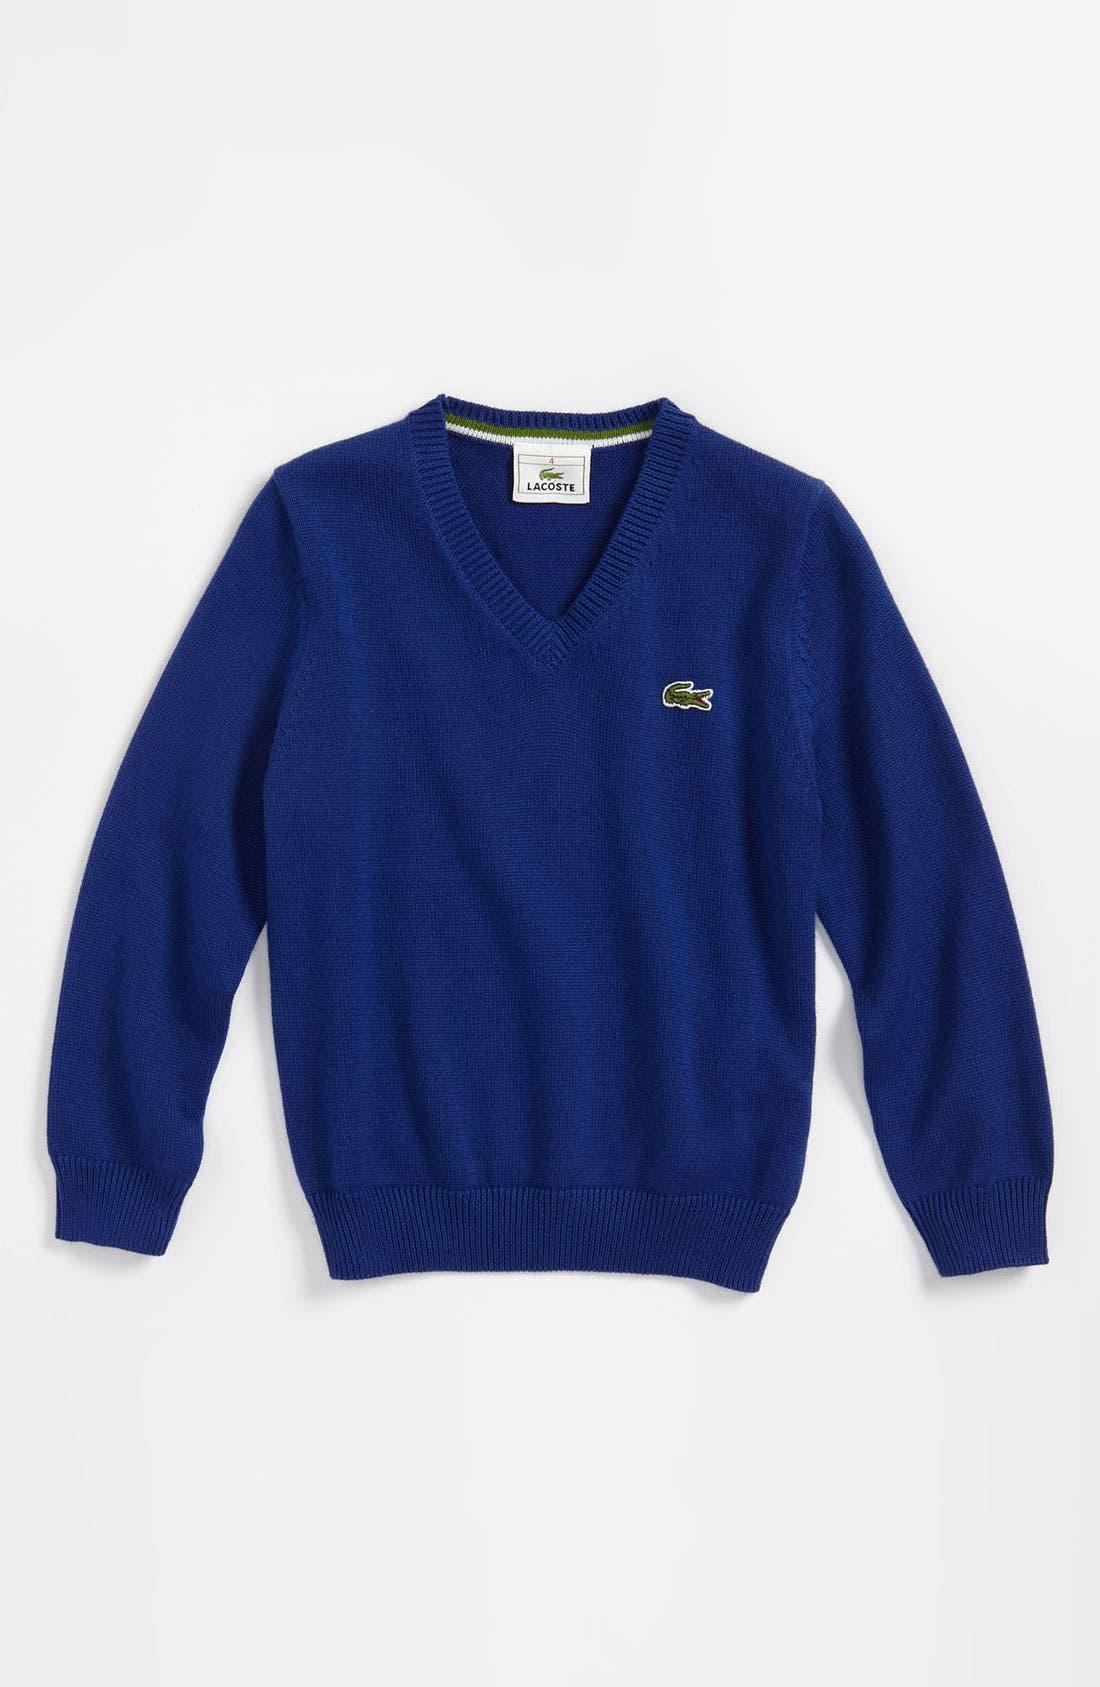 Alternate Image 1 Selected - Lacoste V-Neck Sweater (Toddler)